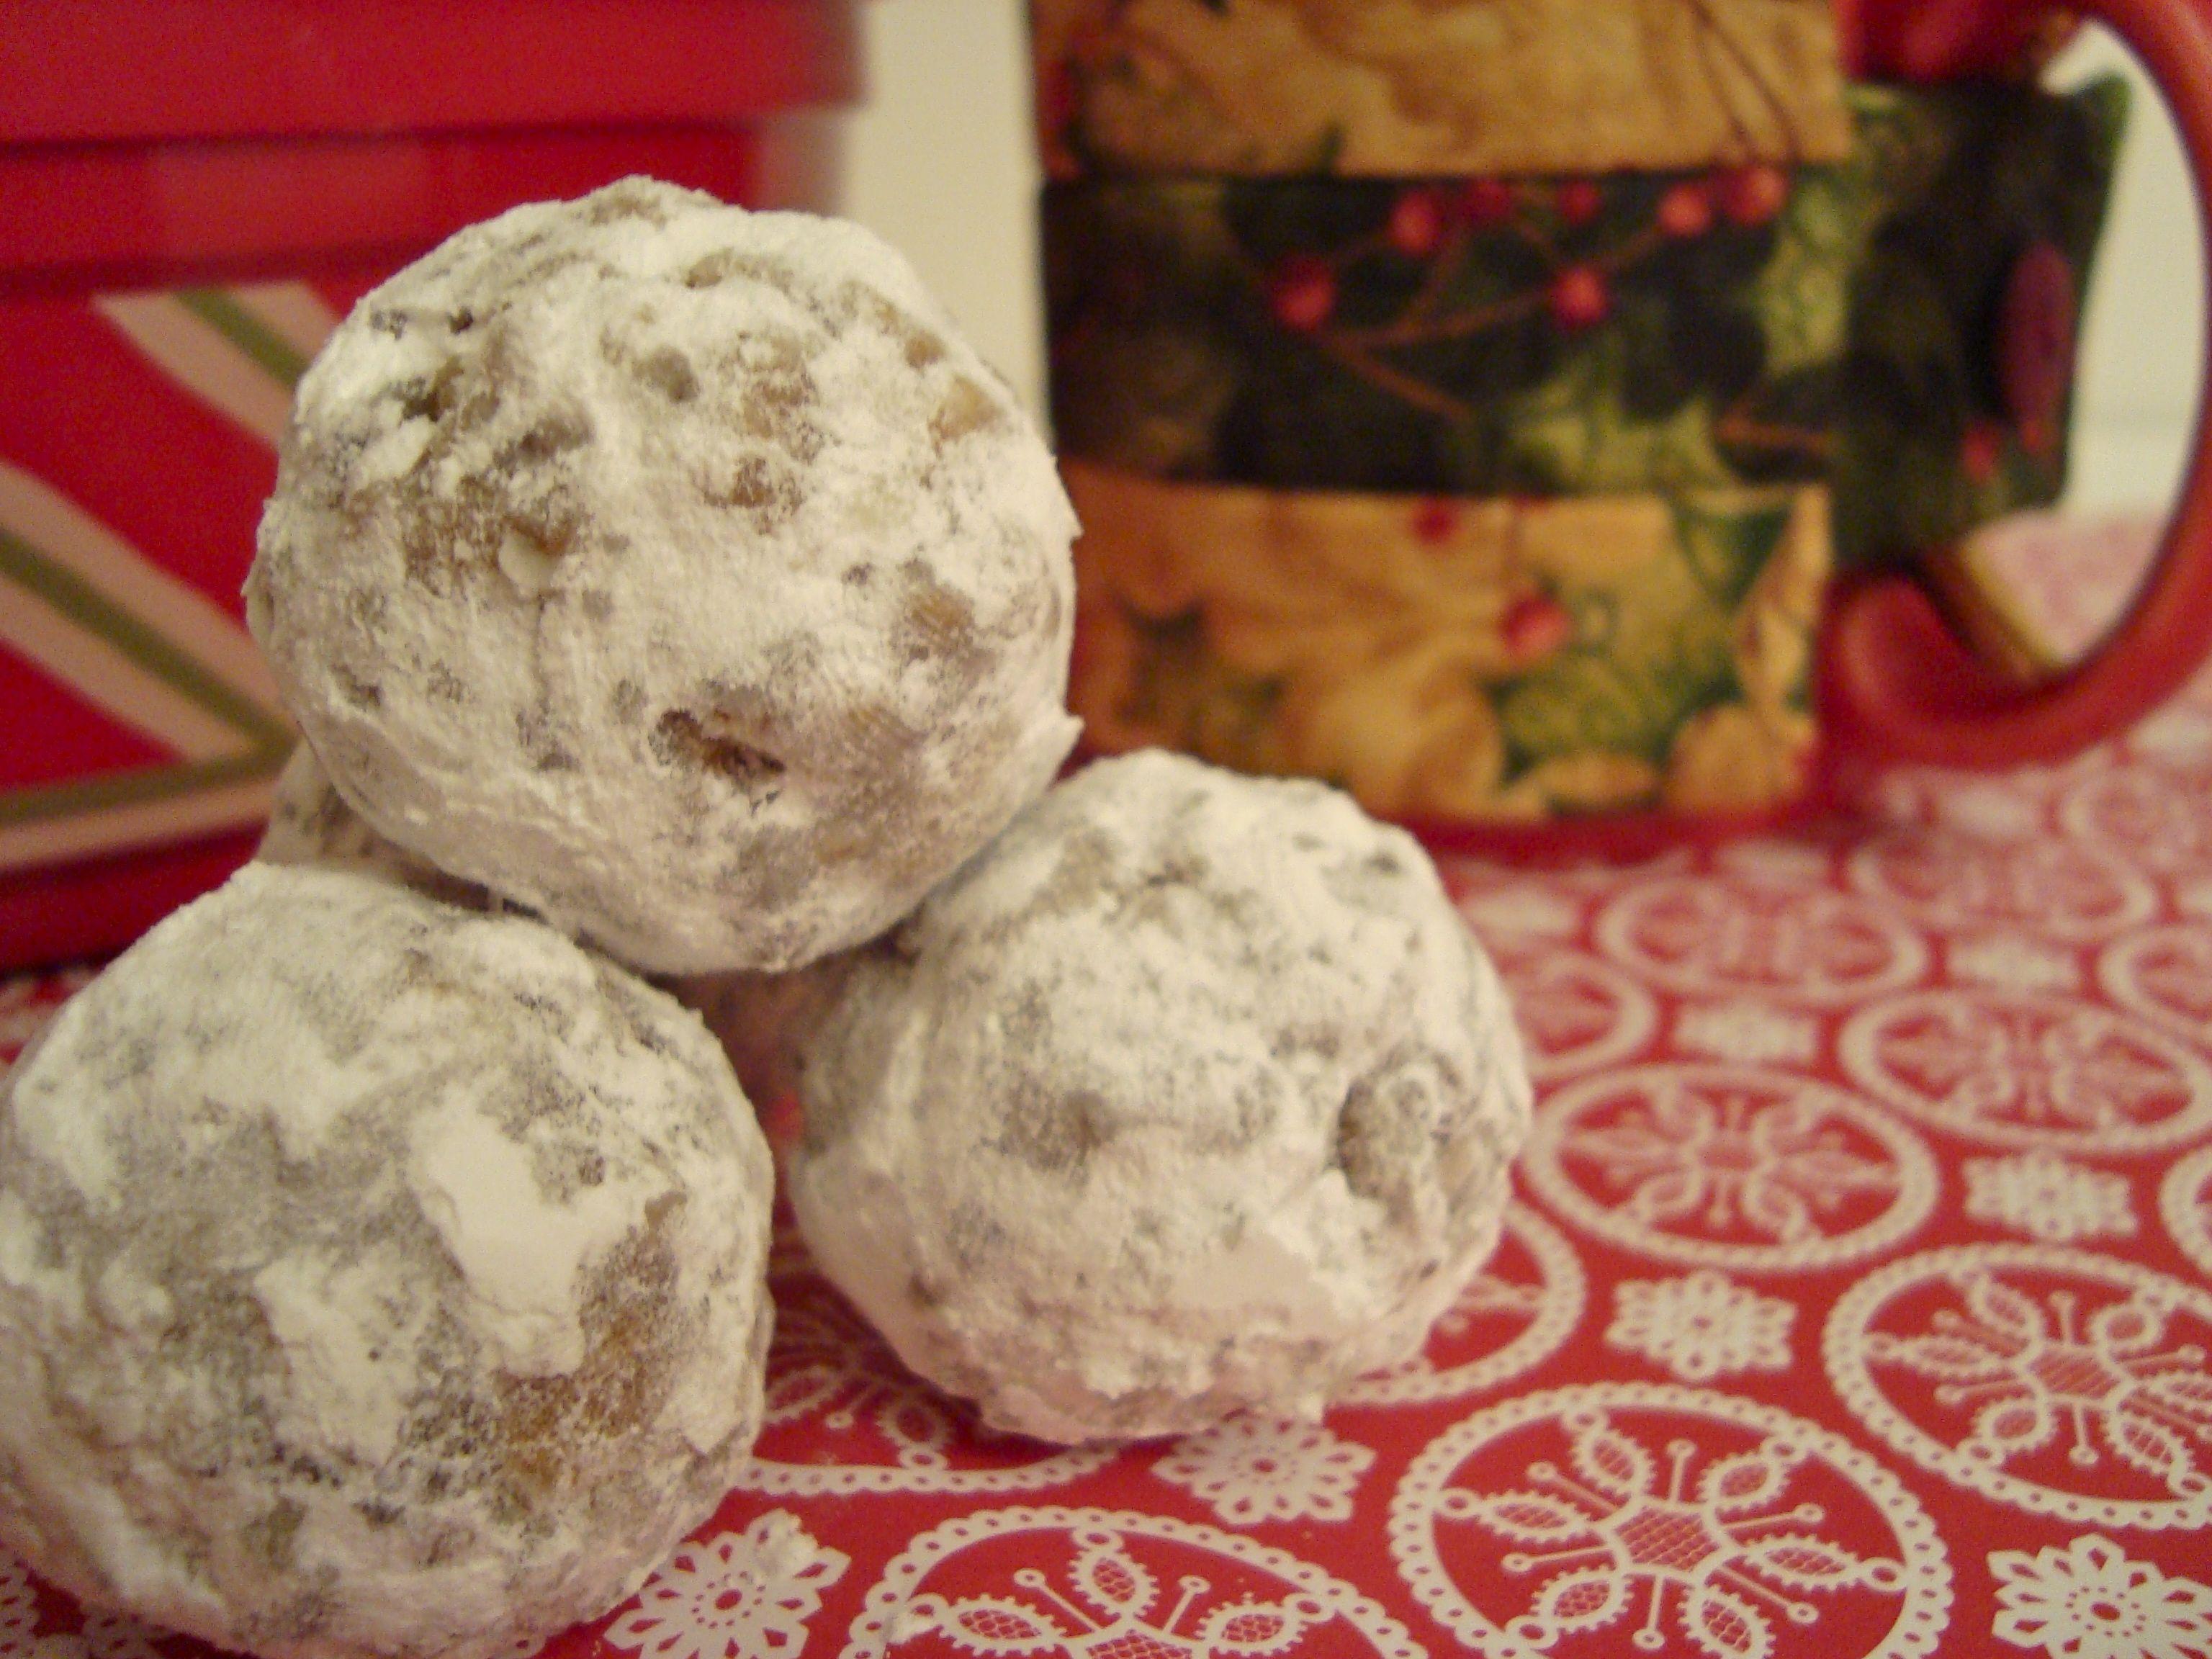 Maureens Rice Krispie Cookies: A no-bake cookie, delicious